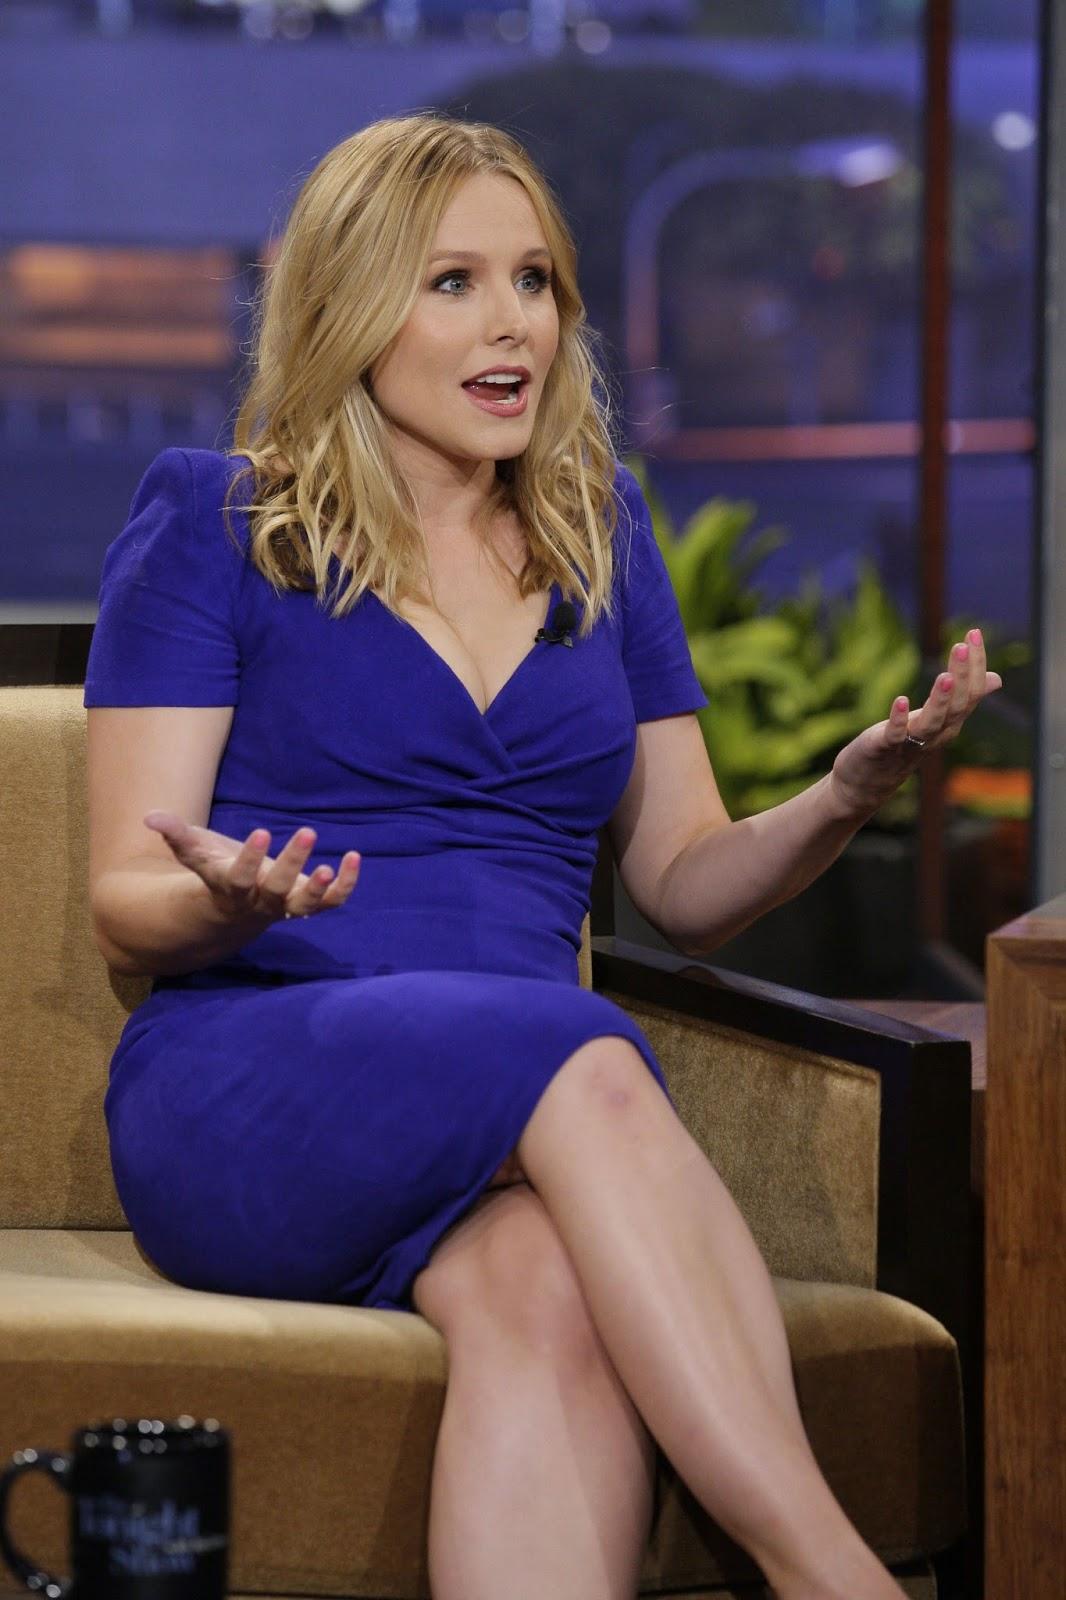 Gossip Girl Wallpapers Hd Kristen Bell Is Looking In Blue Hot Pics High Resolution